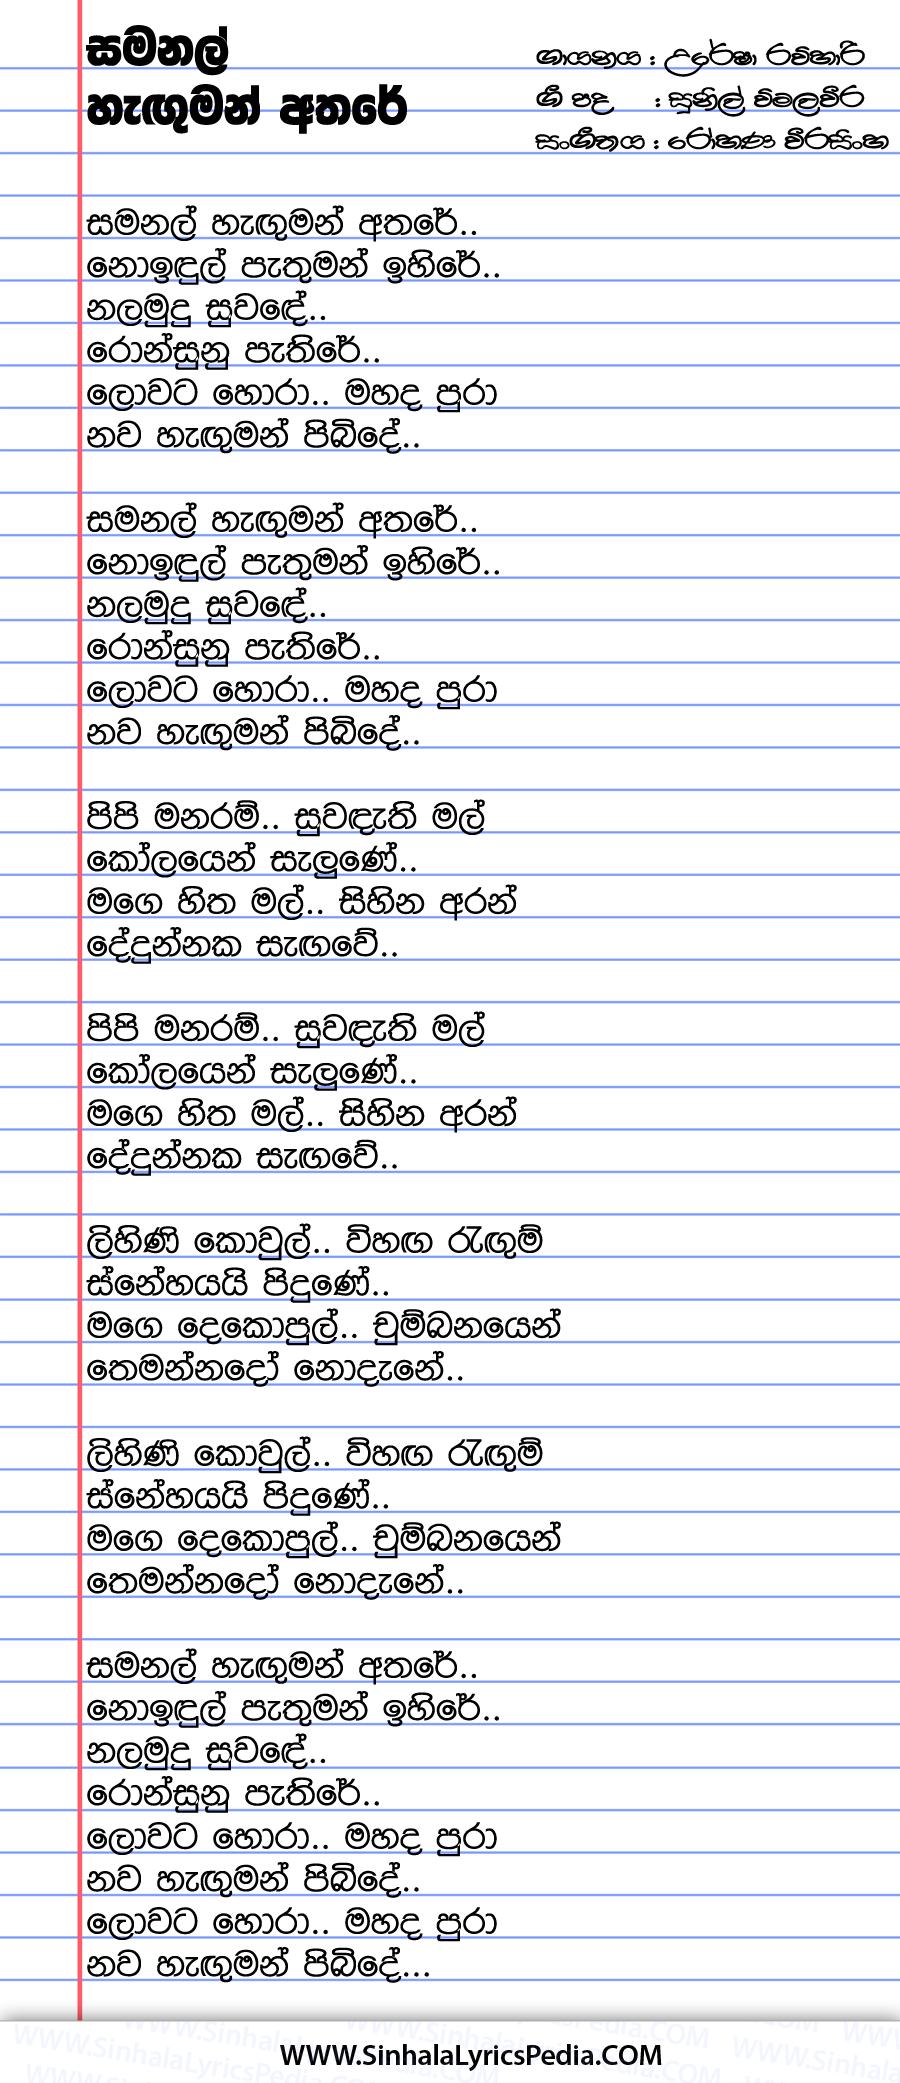 Samanal Hanguman Athare Song Lyrics